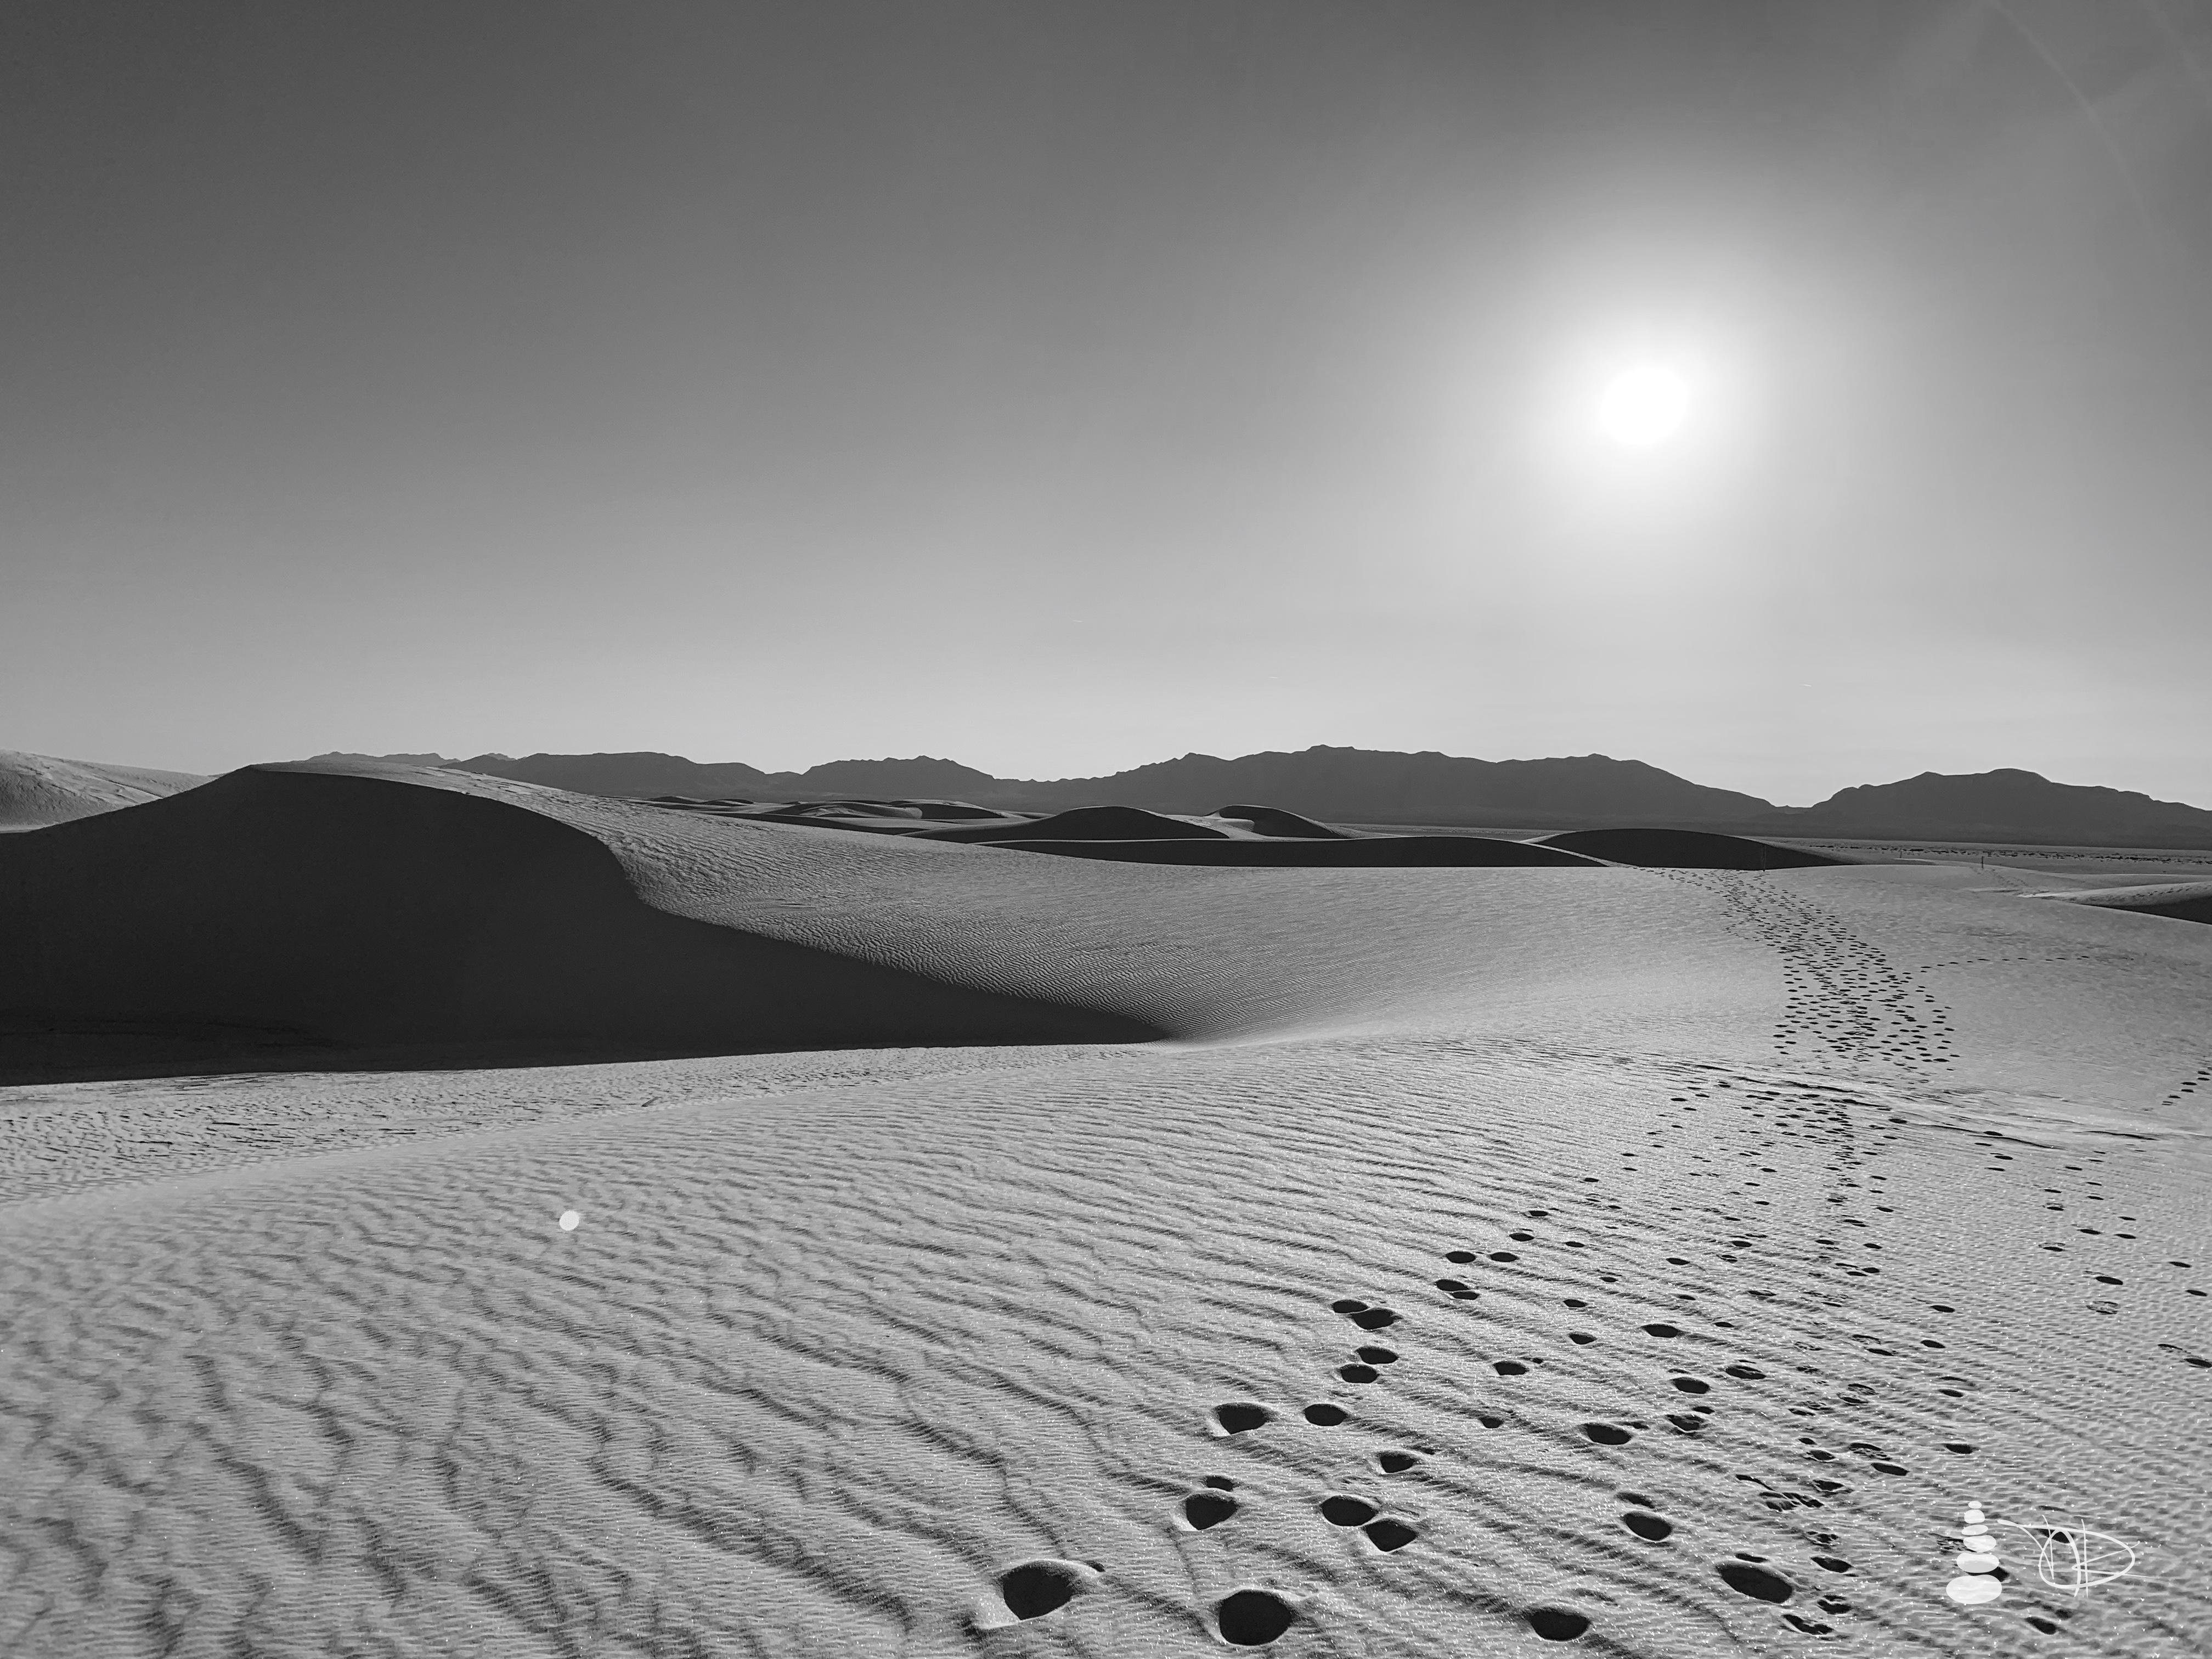 Western Shadows Gallery | Footprints